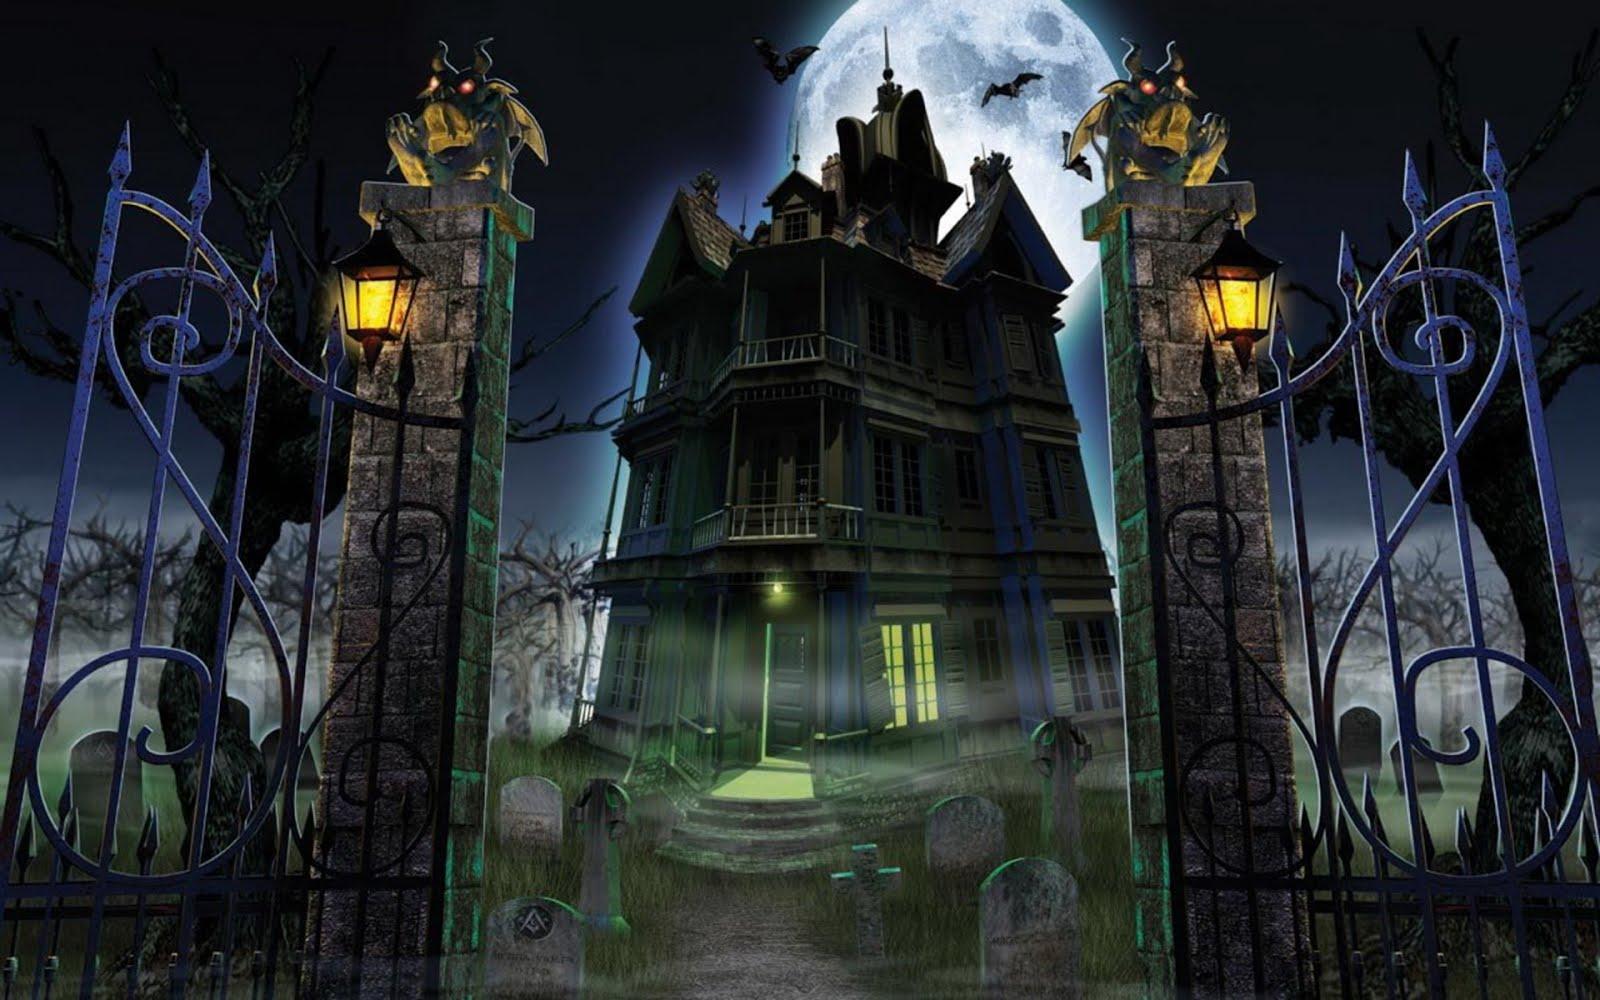 http://1.bp.blogspot.com/-28wZL4JeZG0/UIiCabqlpnI/AAAAAAABMkE/ixCNZ-0rHsw/s1600/imagenes-para-halloween-1900x1080-brujas-monsters-fantasmas-calabazas---16.jpg